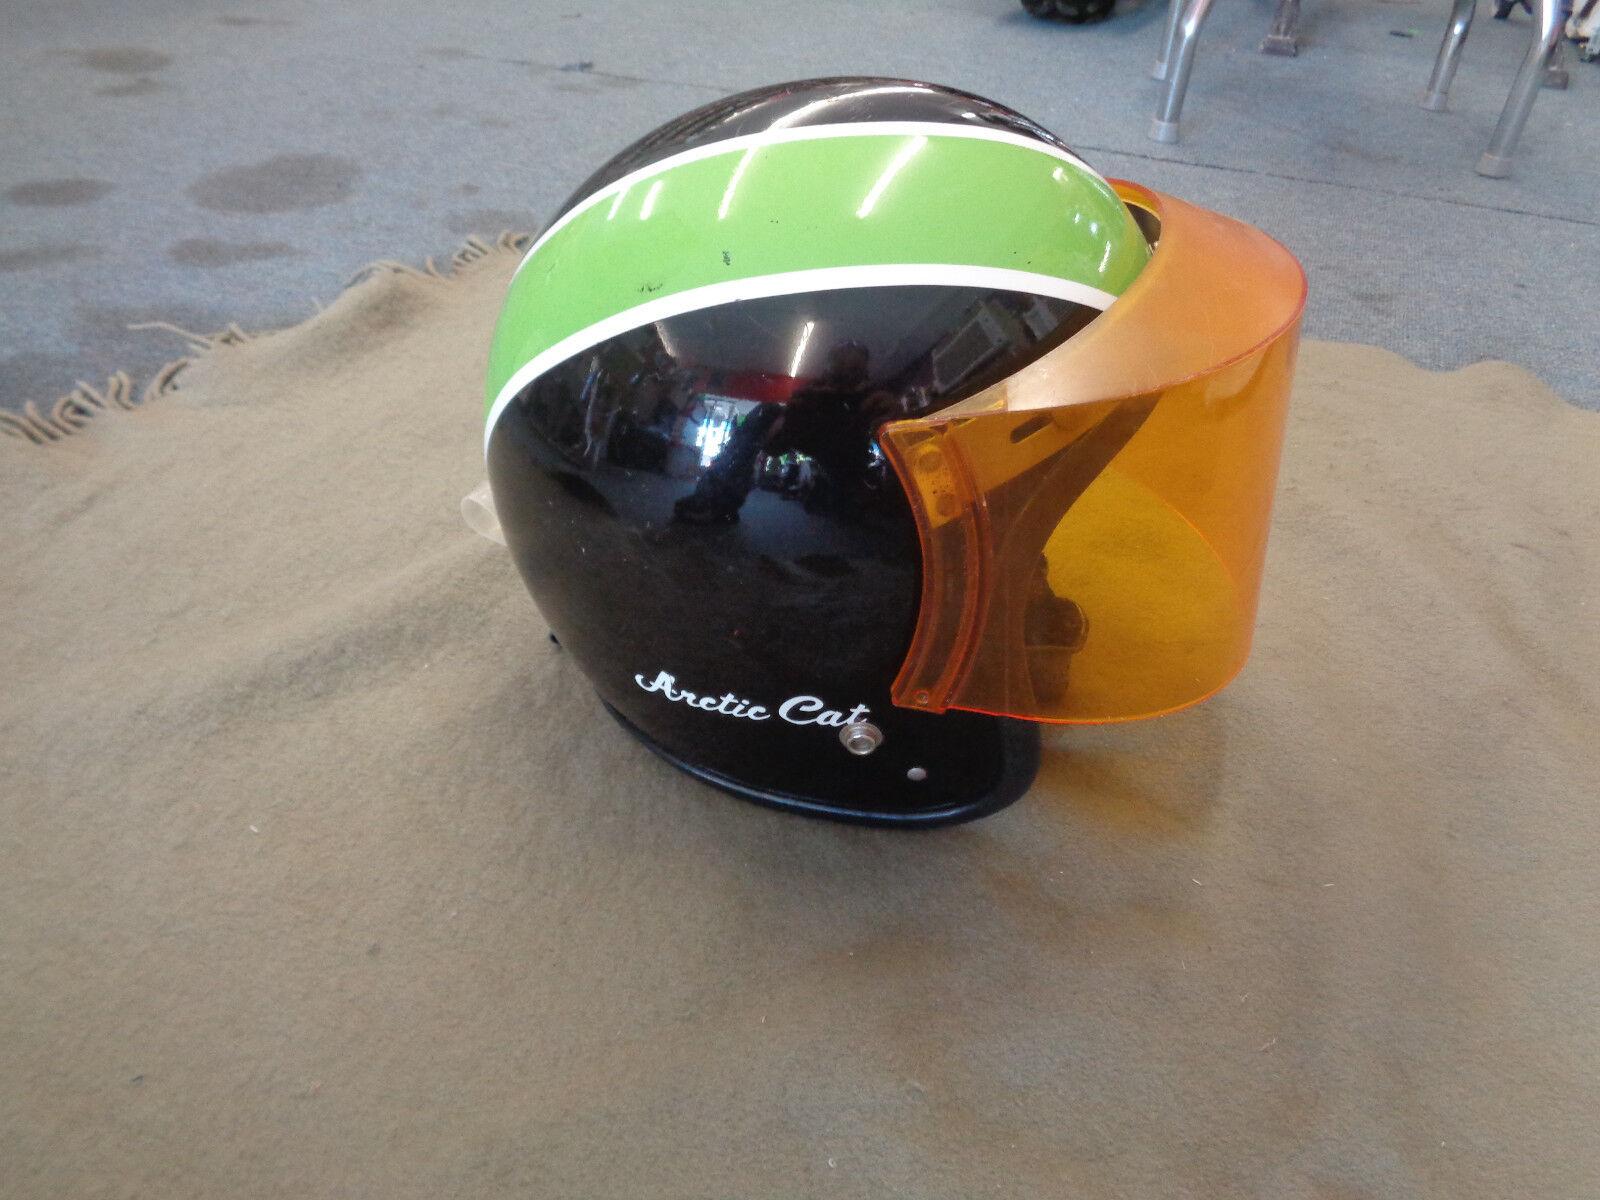 Vintage 1970s ARCTIC CAT Snowmobile Helmet - Used - Size Large orange Shield